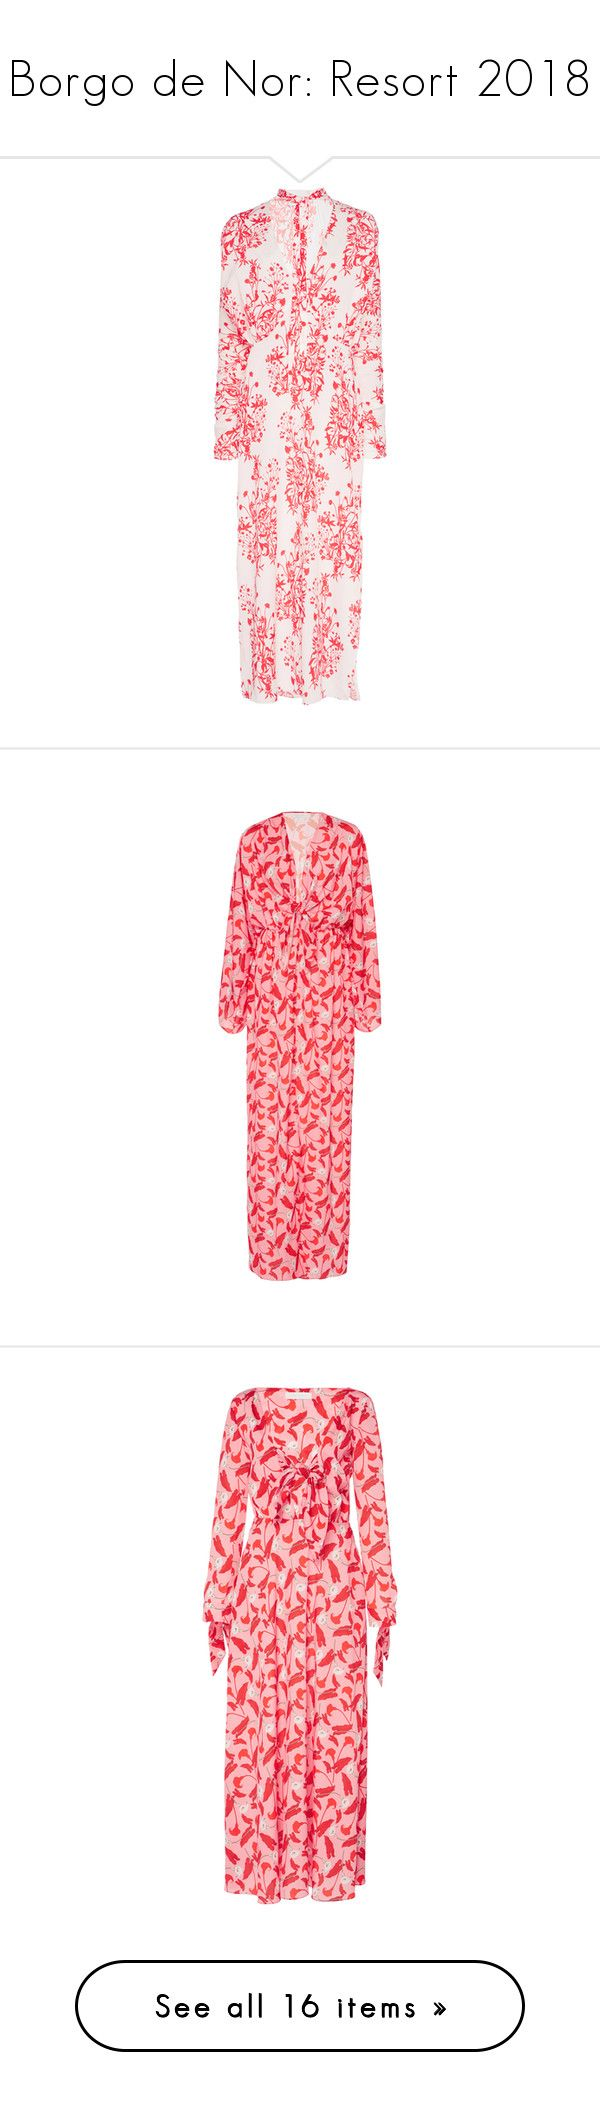 """Borgo de Nor: Resort 2018"" by livnd ❤ liked on Polyvore featuring livndfashion, resort2018, livndborgodenor, BorgodeNor, dresses, print, tie neck tie, pink dress, neck tie dress and low v neck dress"